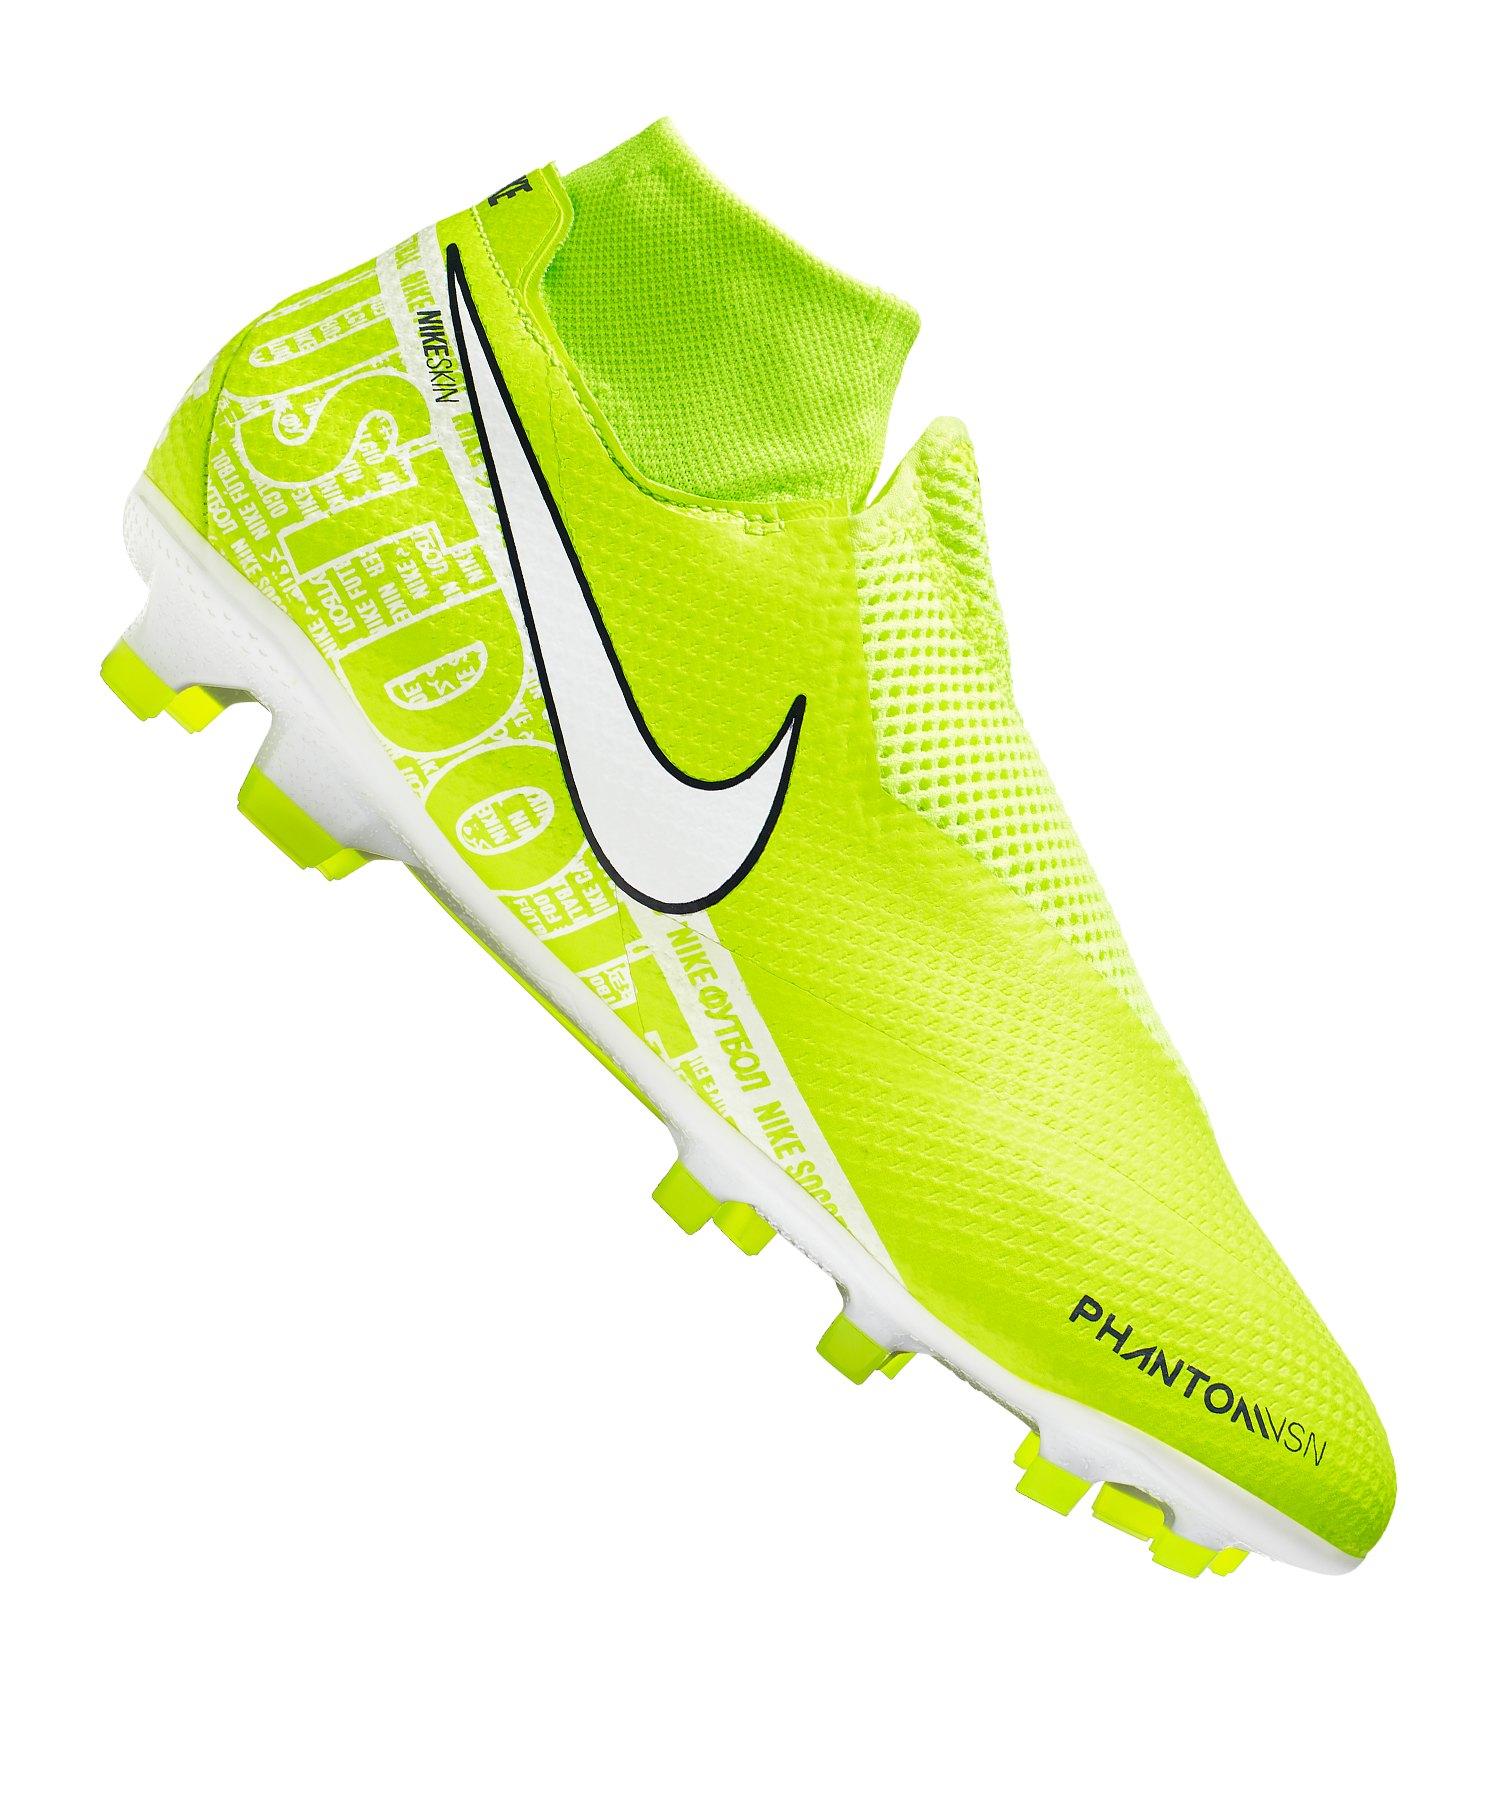 Nike Phantom Vision Pro FG Gelb Weiss F717 - gelb